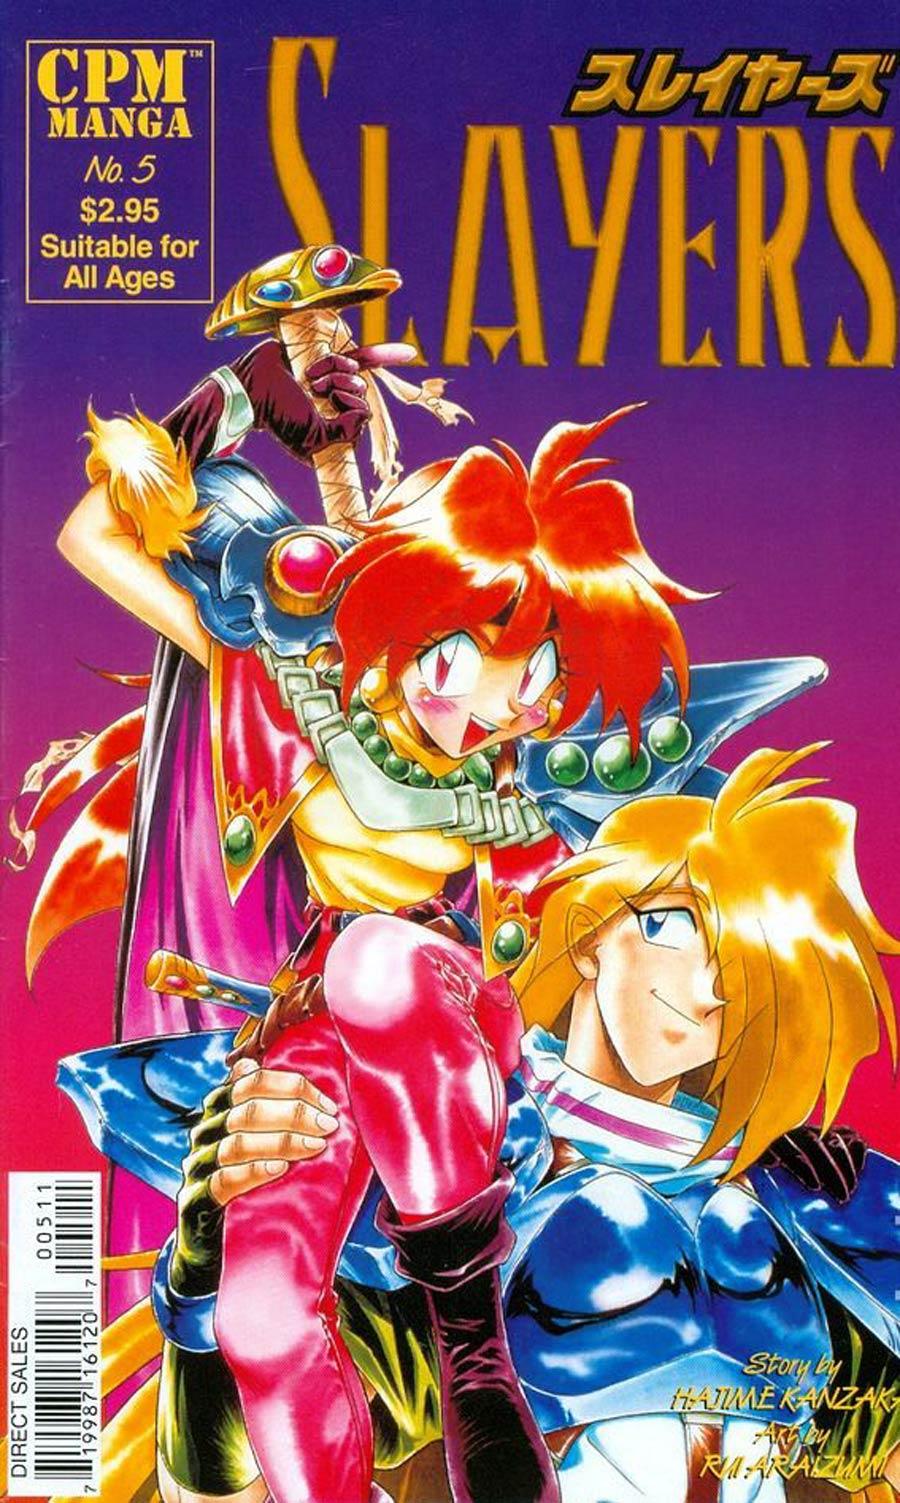 Slayers #5